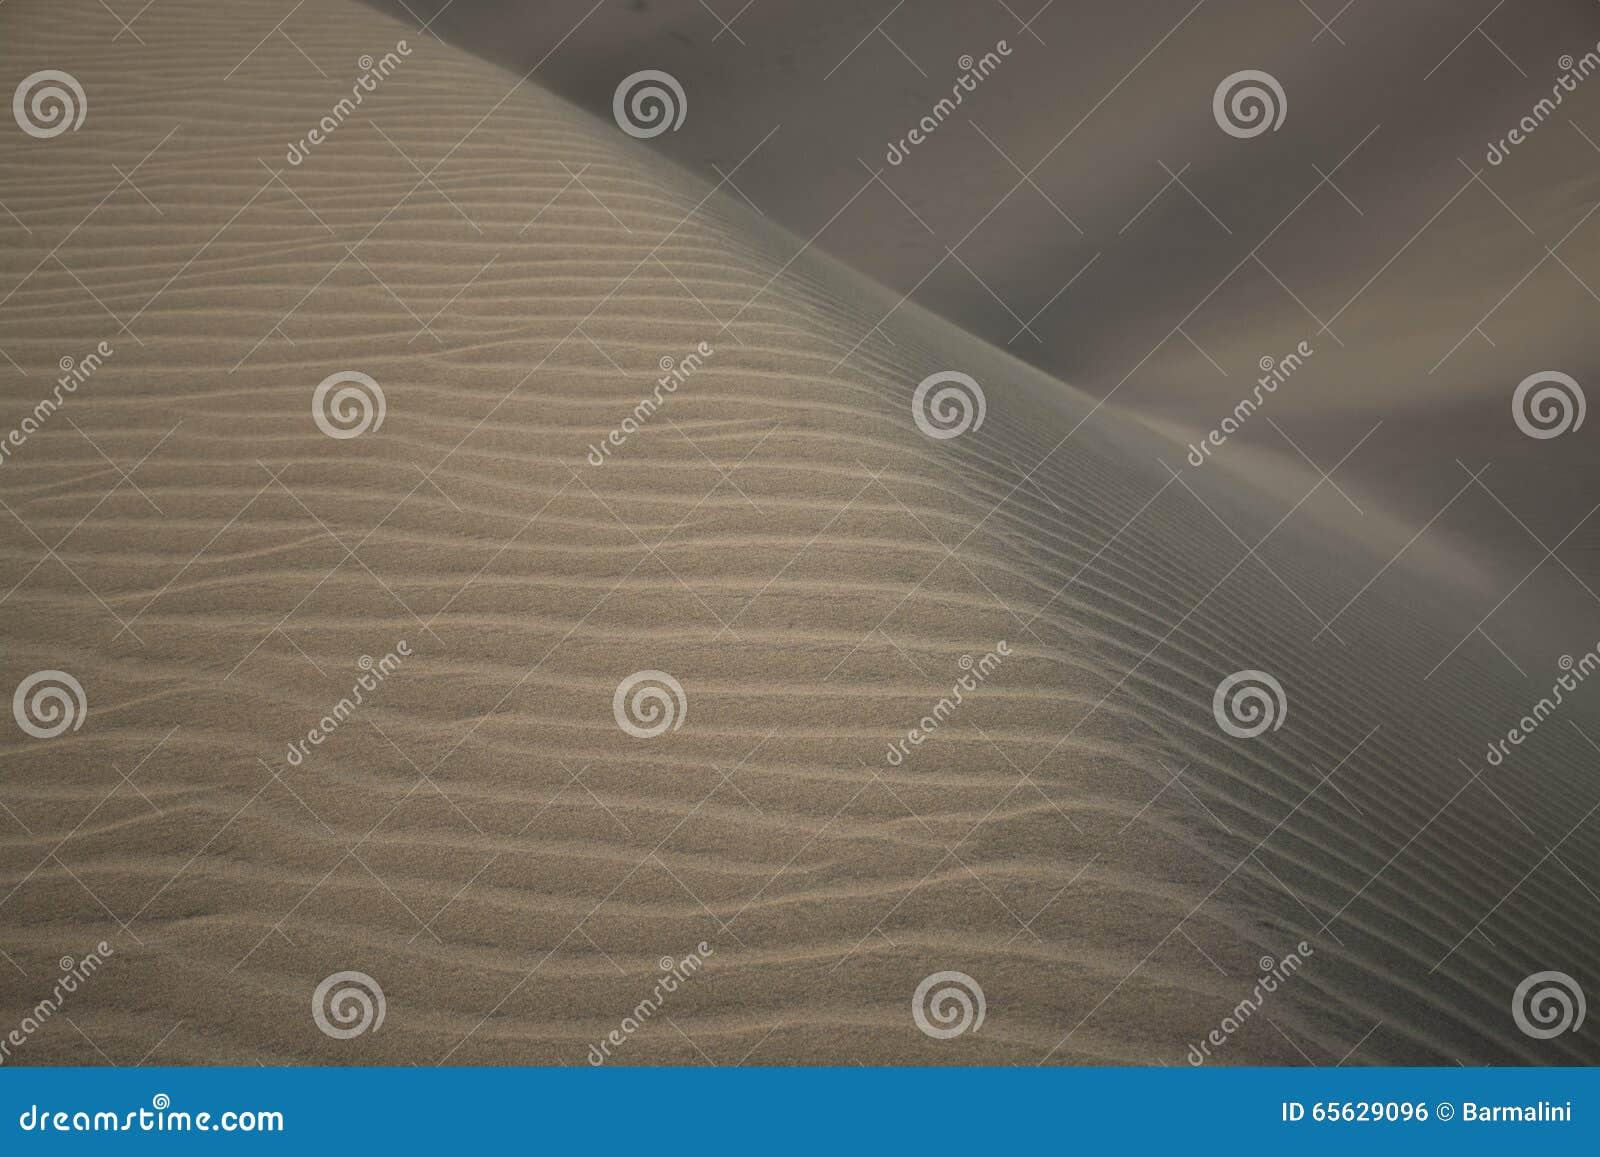 Dunes de sable, différentes textures, Maspalomas, mamie Canaria